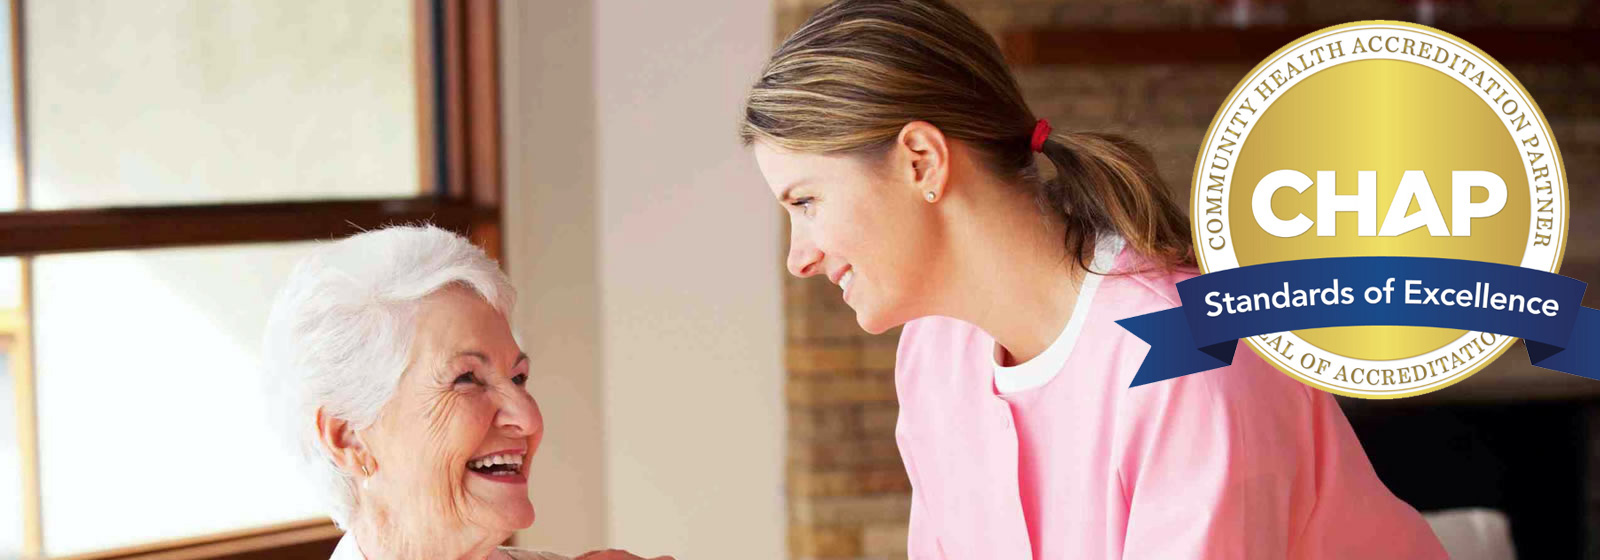 We provide Skilled Nursing/Private Duty Nursing for you